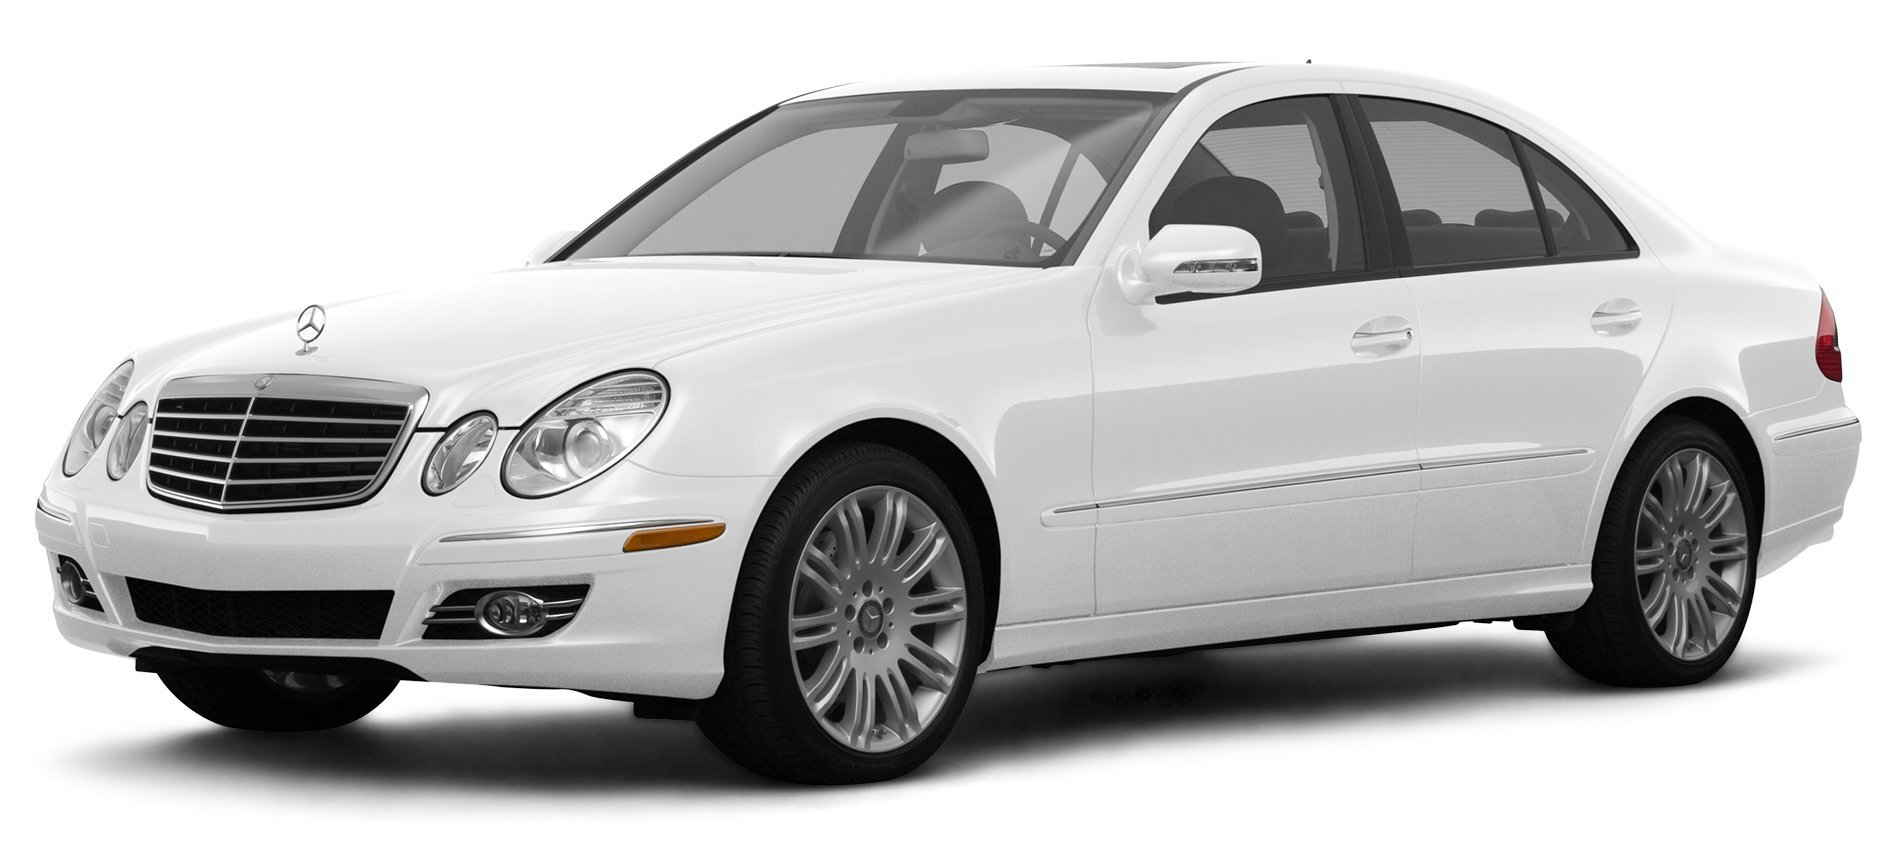 2008 mercedes benz e320 reviews images and specs vehicles. Black Bedroom Furniture Sets. Home Design Ideas